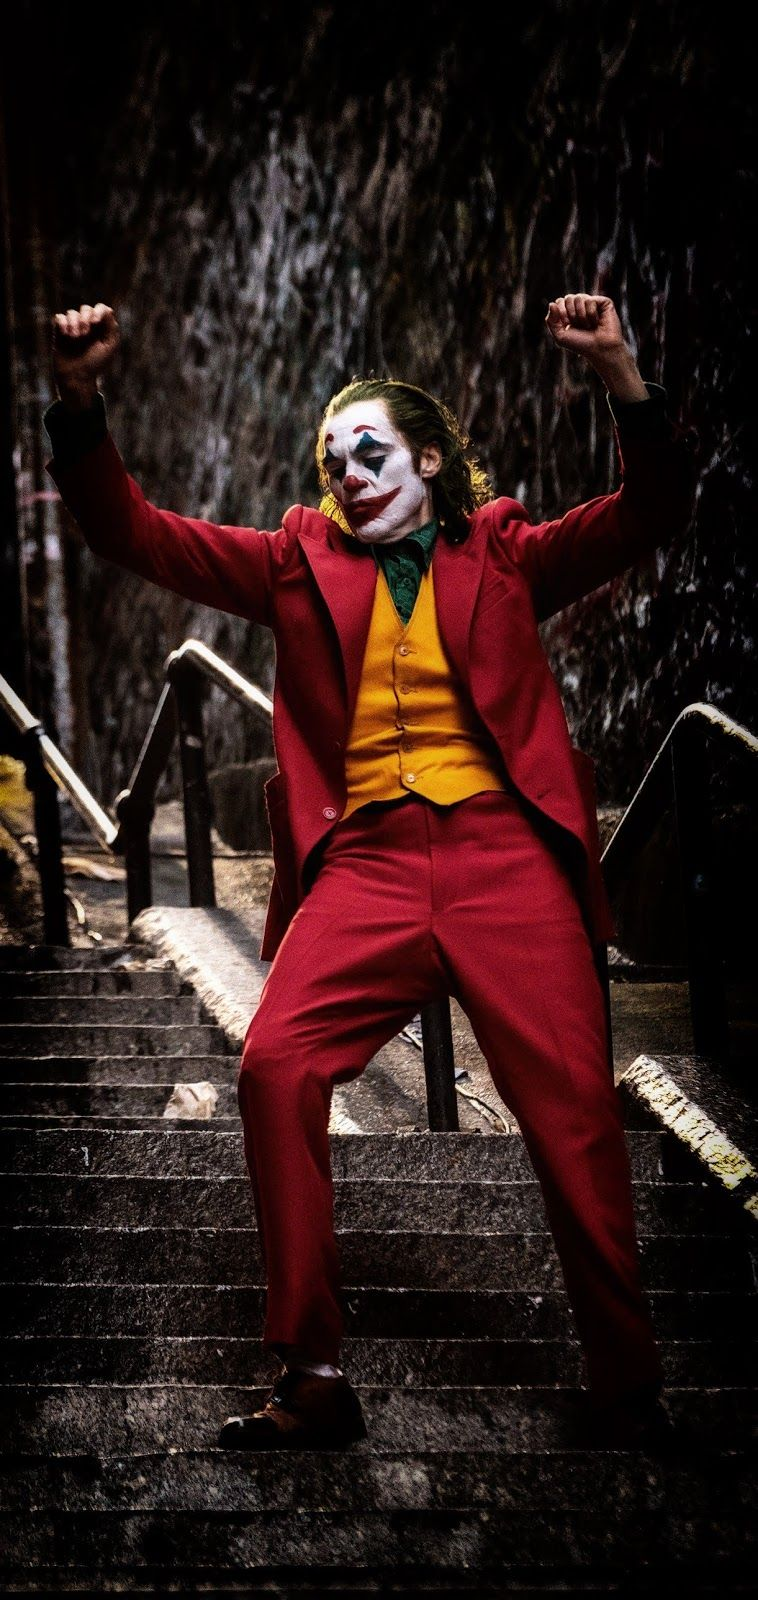 4k Amoled Wallpapers Download Joker 2019 Joker Wallpapers Joker Hd Wallpaper Amoled Wallpaper